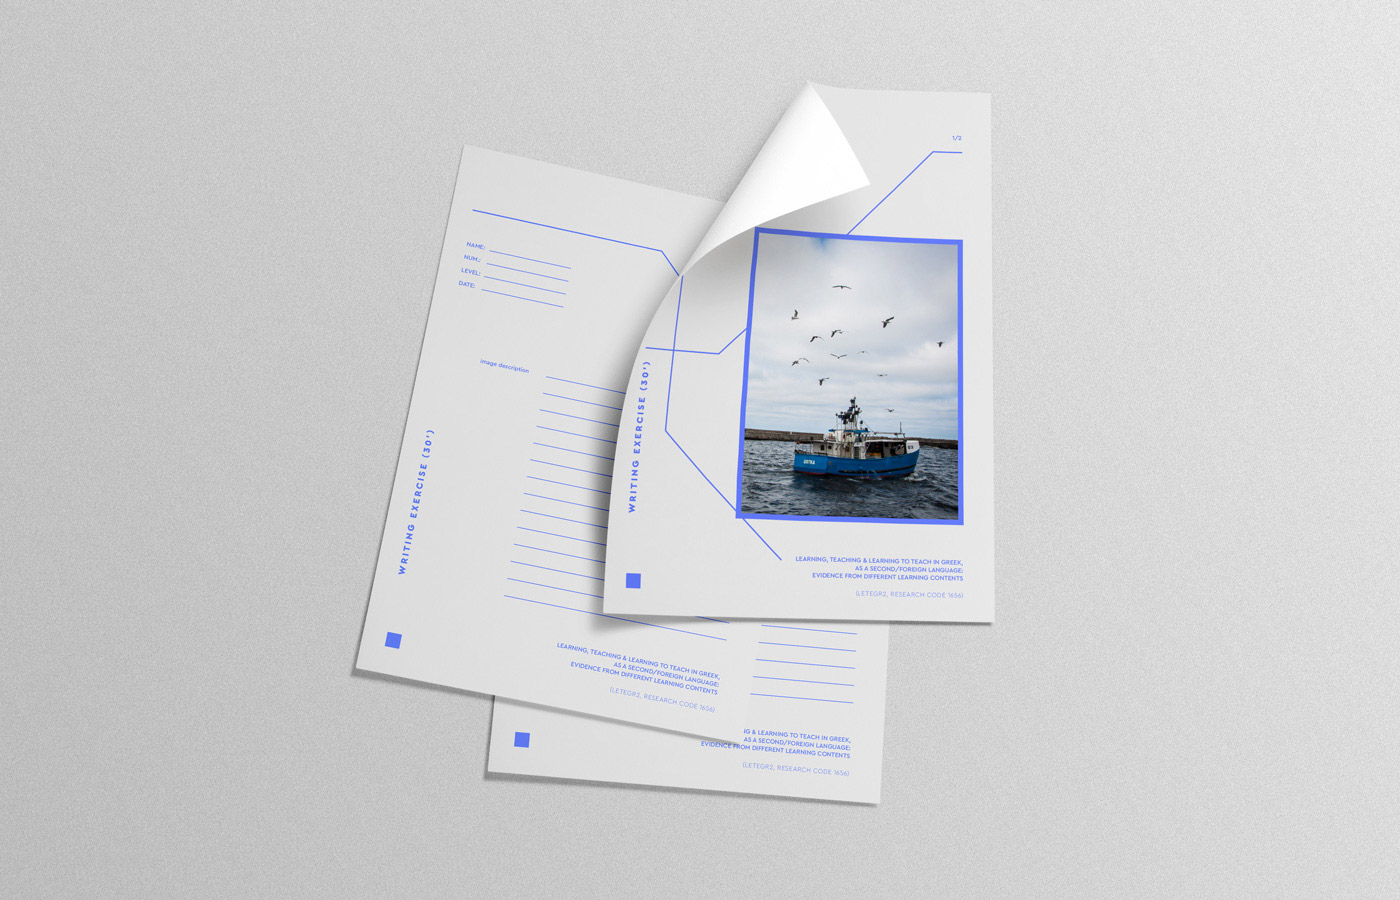 learning teaching greek research university logo design branding stationary paper essay lines photo